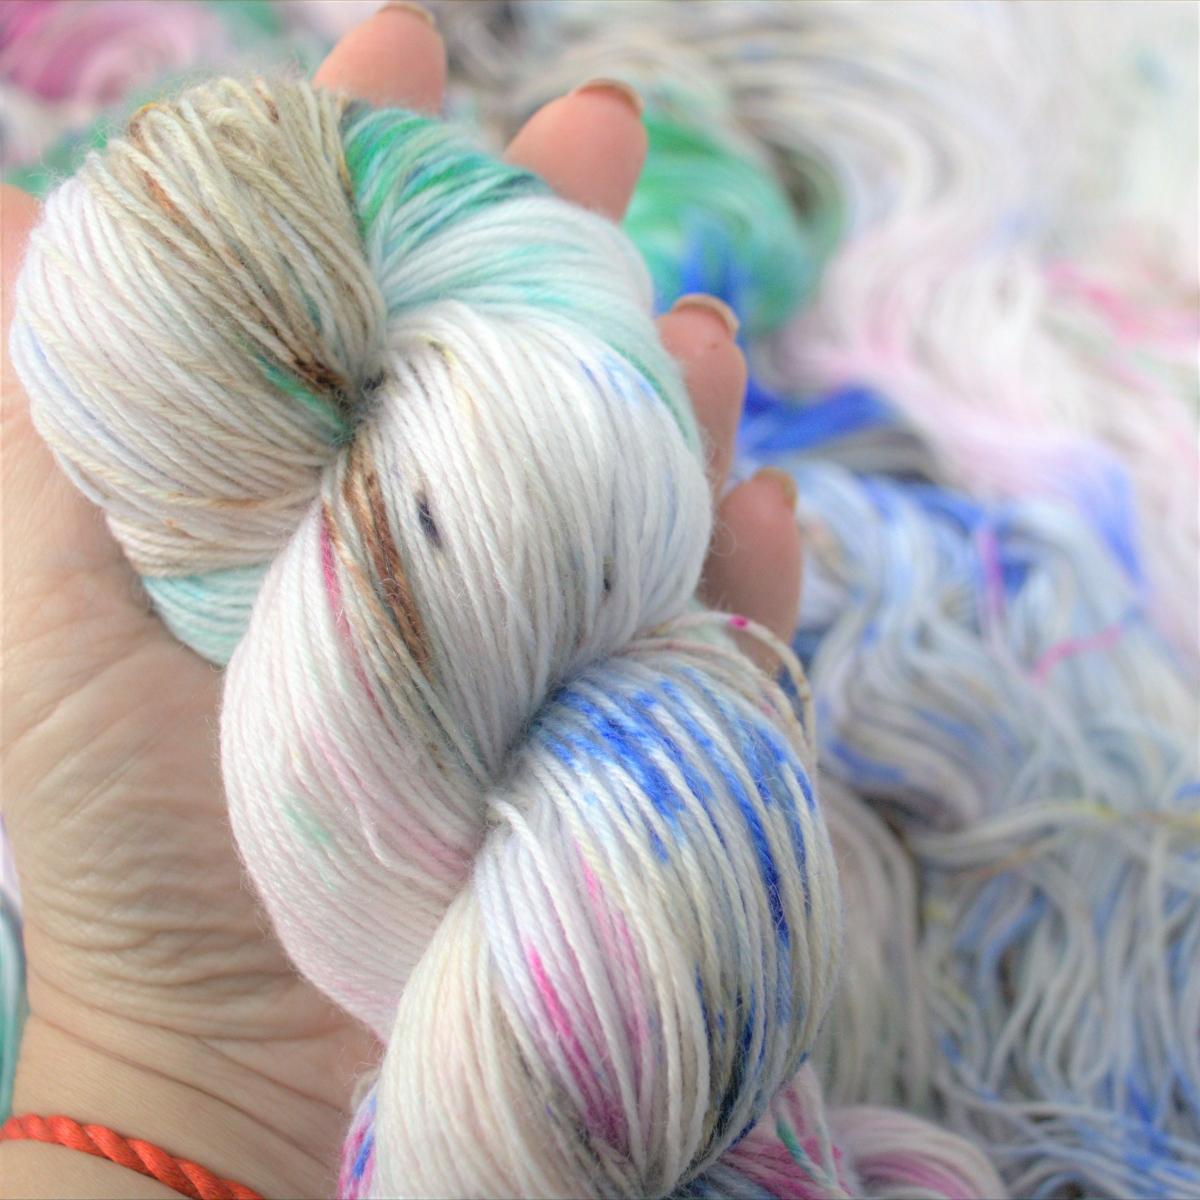 woodico.pro hand dyed yarn 048 1200x1200 - Hand dyed yarn / 048